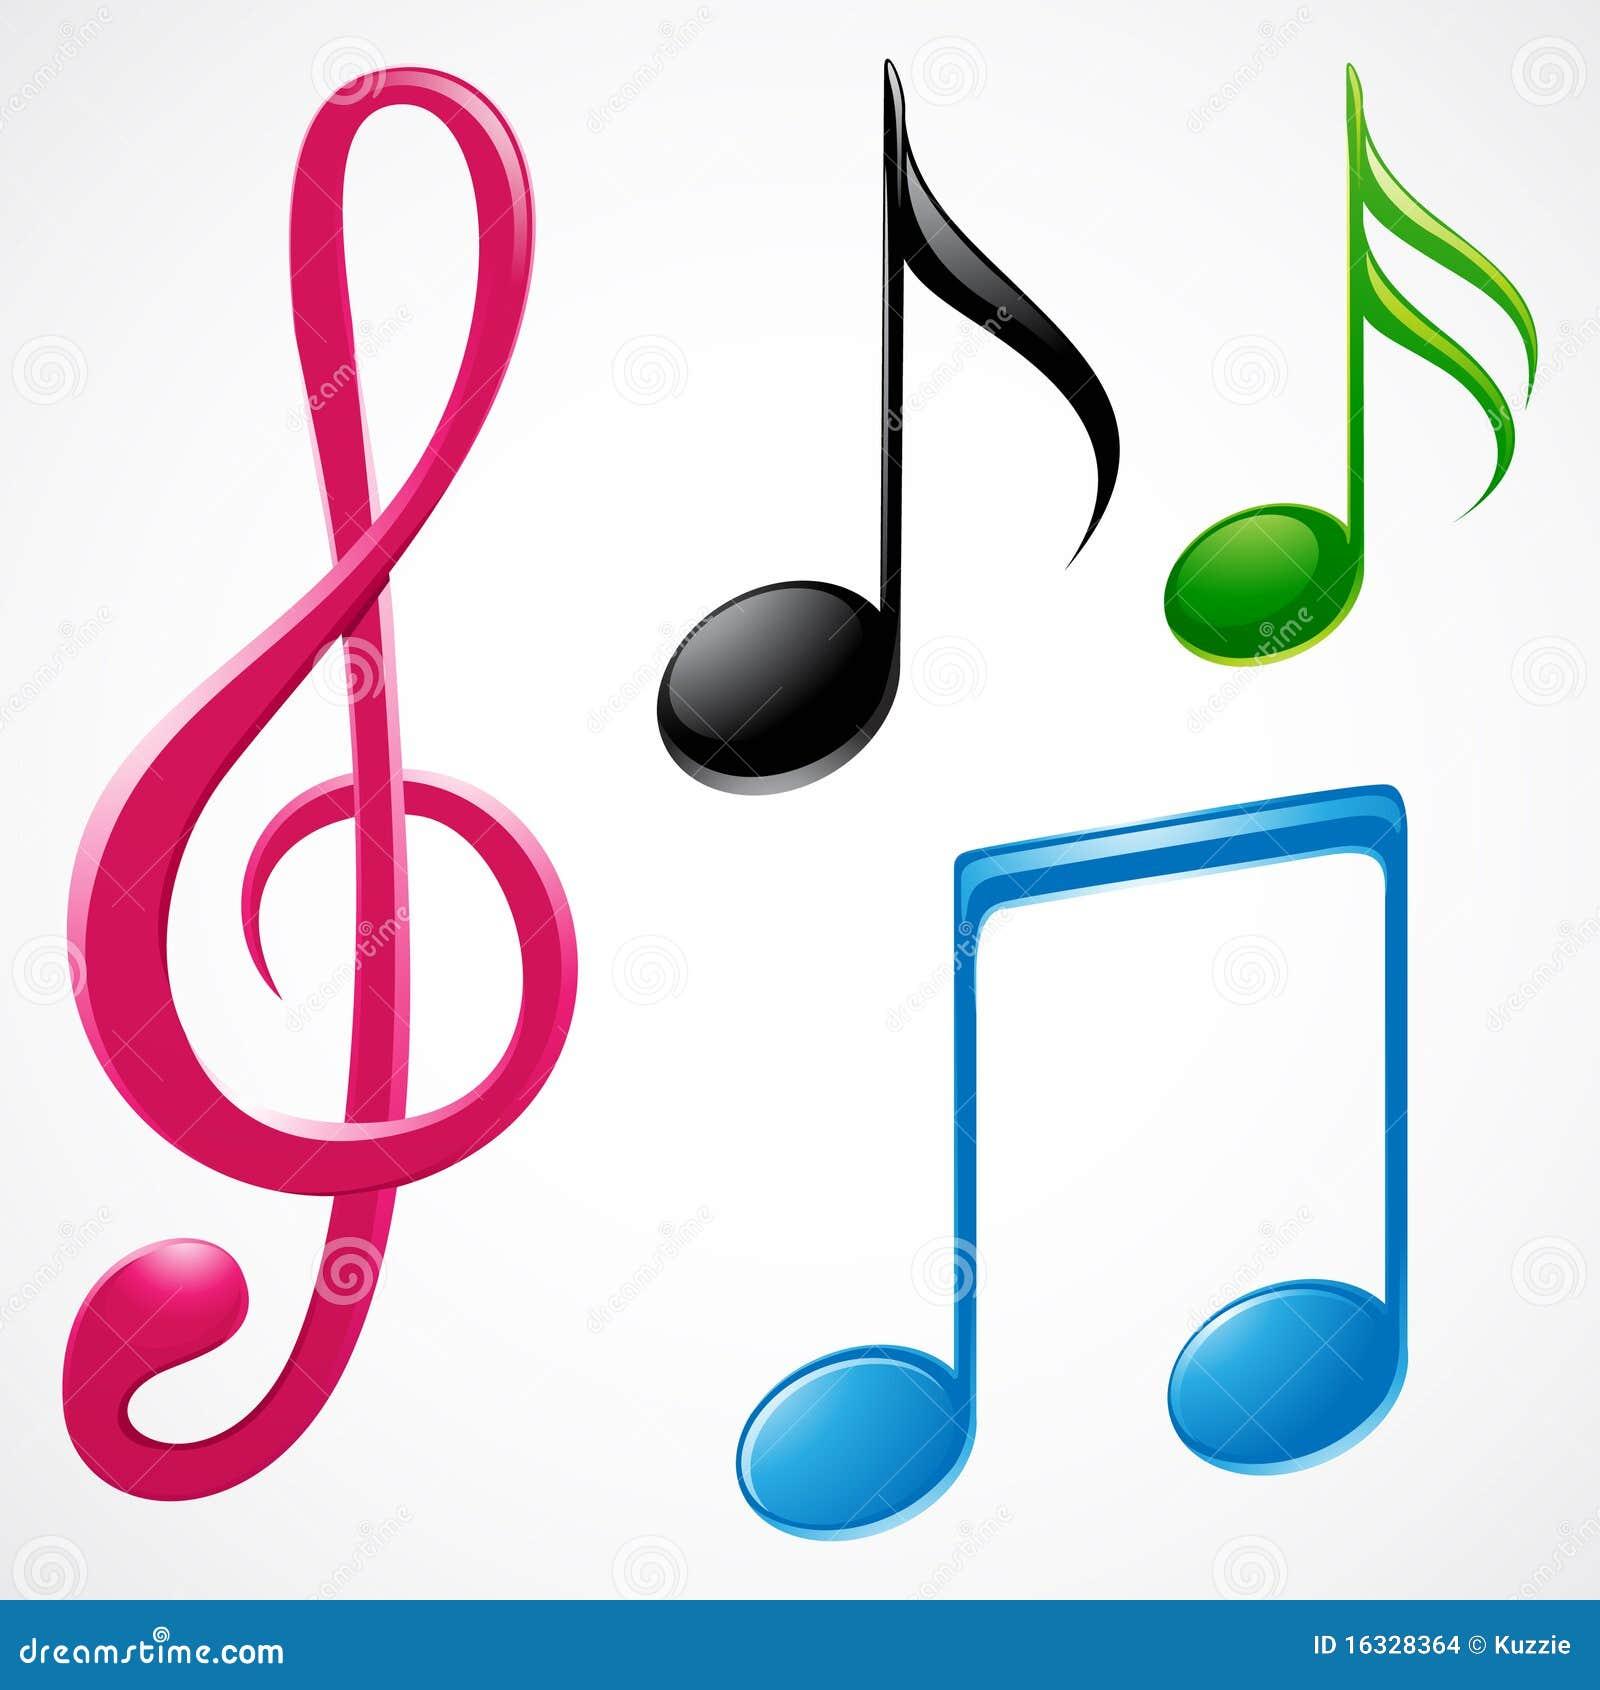 music-notes-16328364.jpg